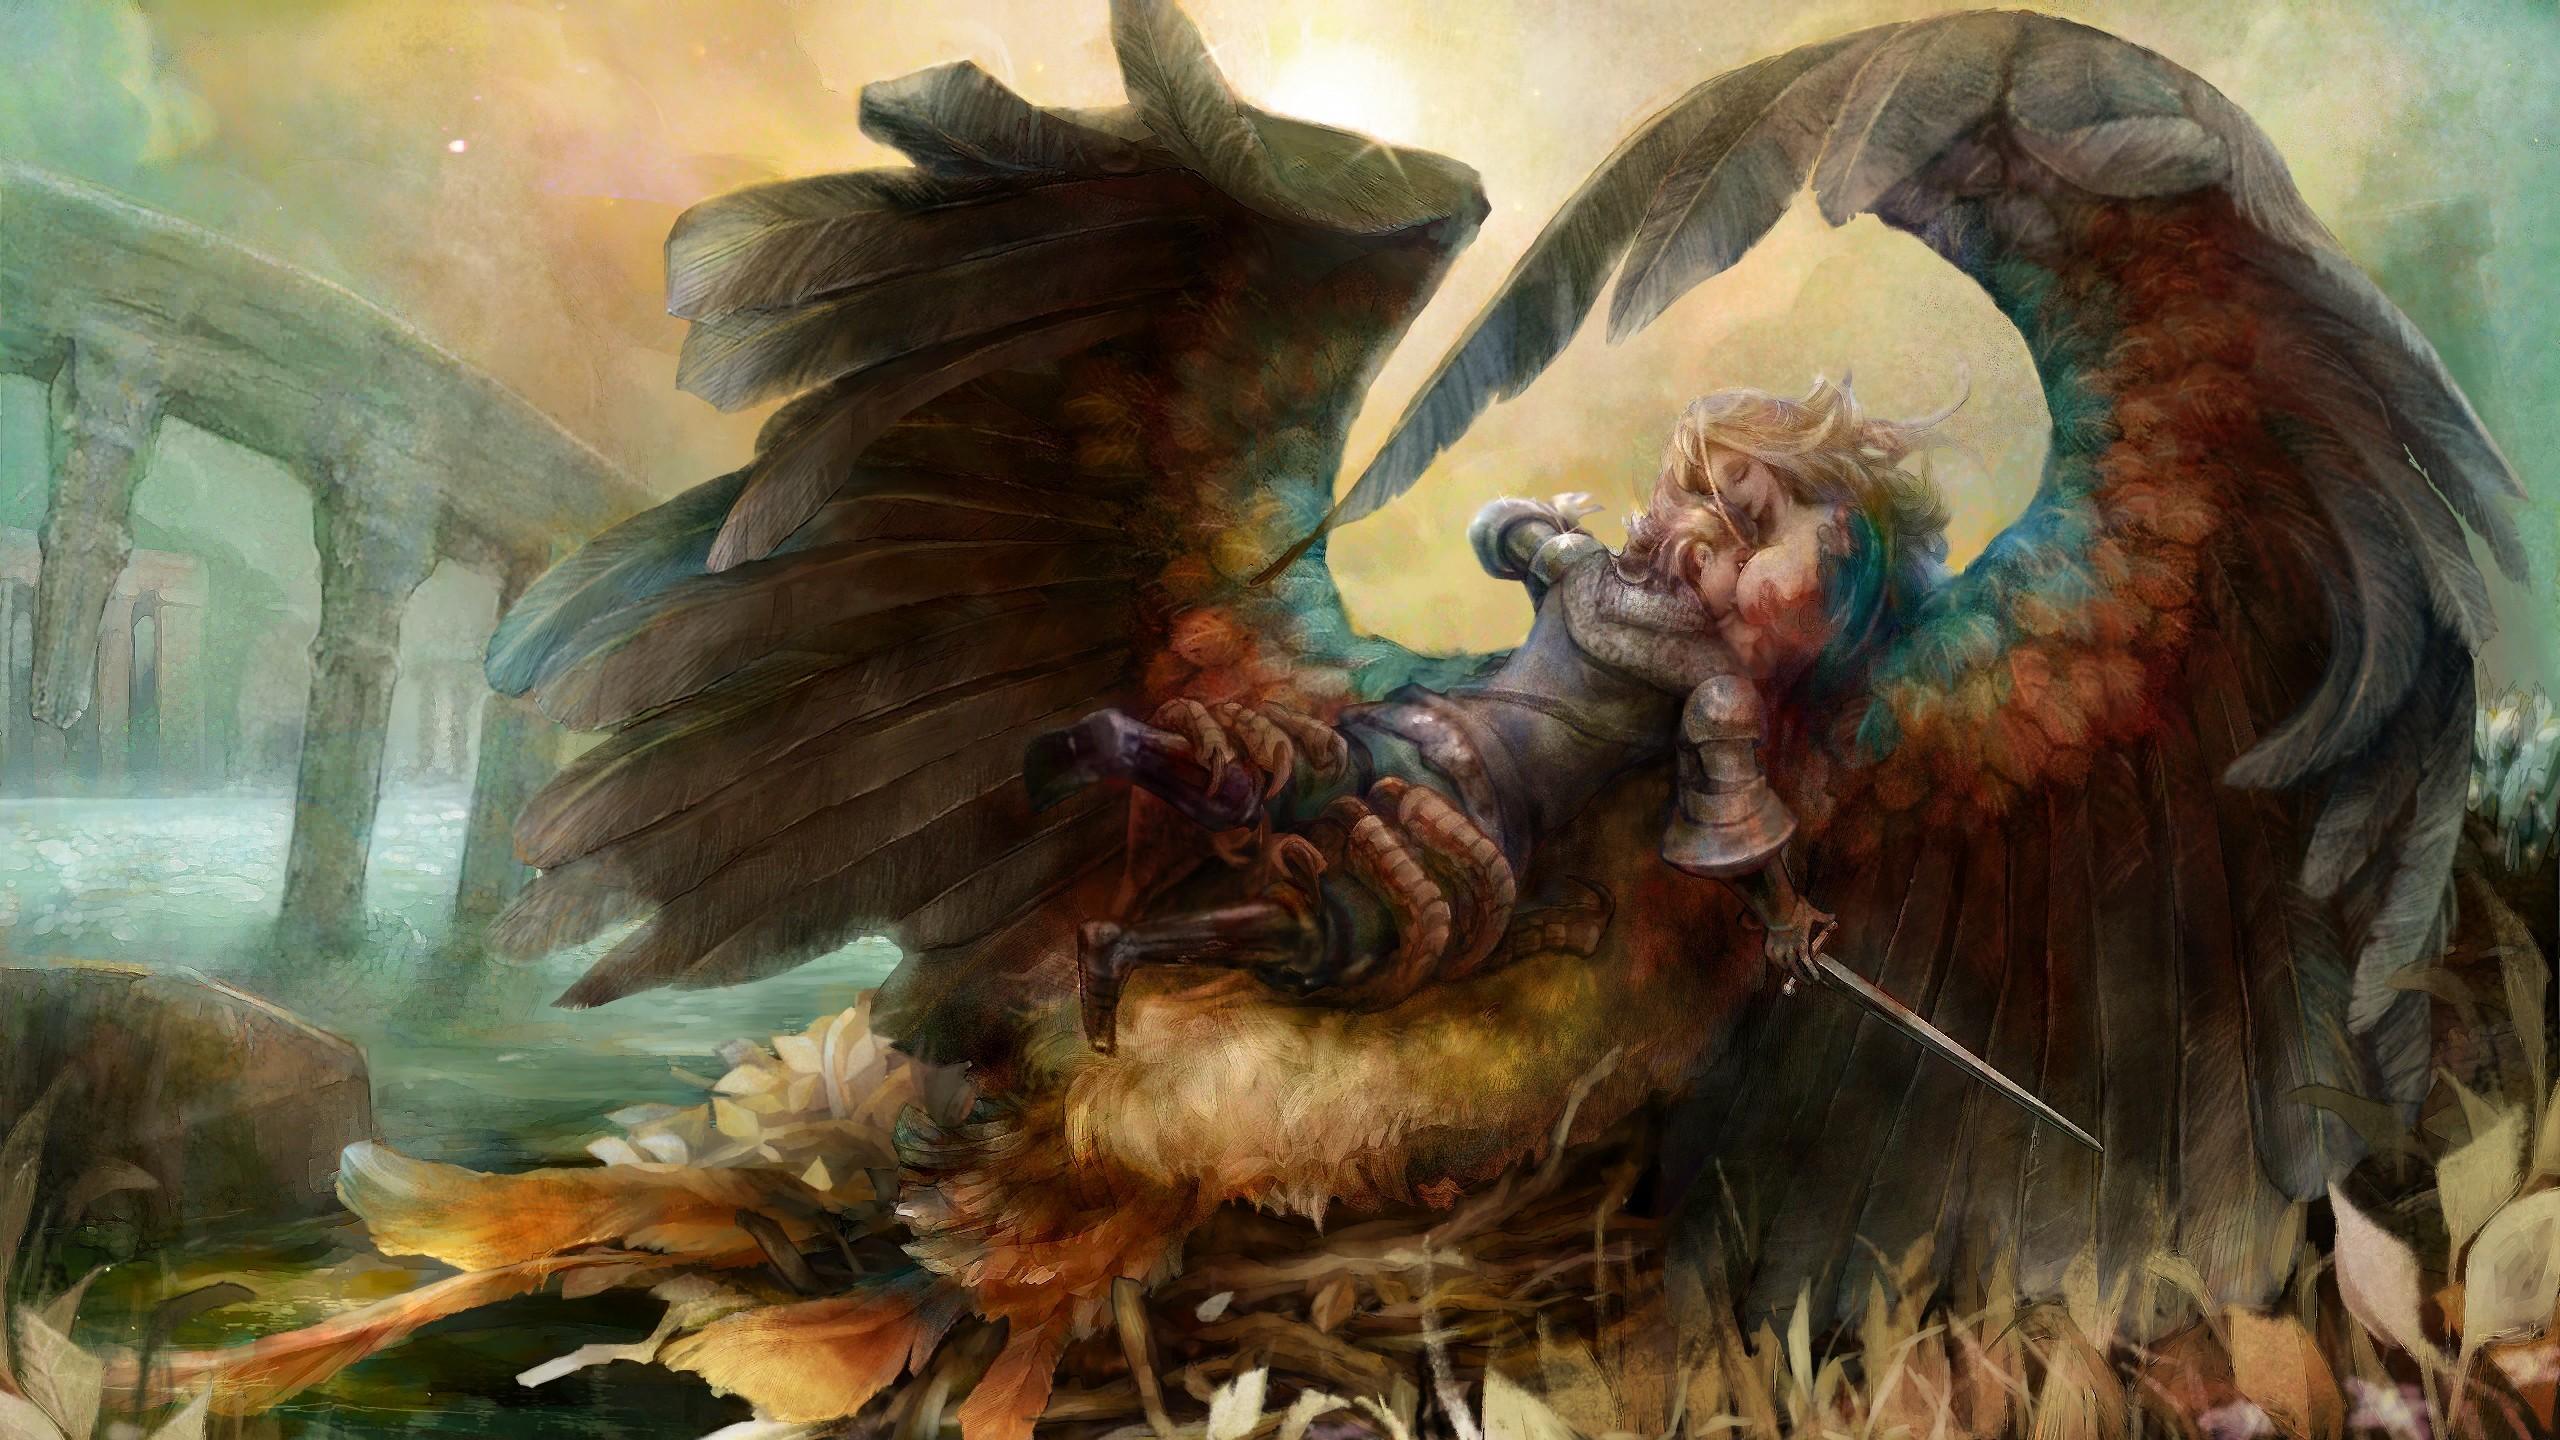 General 2560x1440 harpy knight wings fictional fantasy art fantasy girl Dragon's Crown